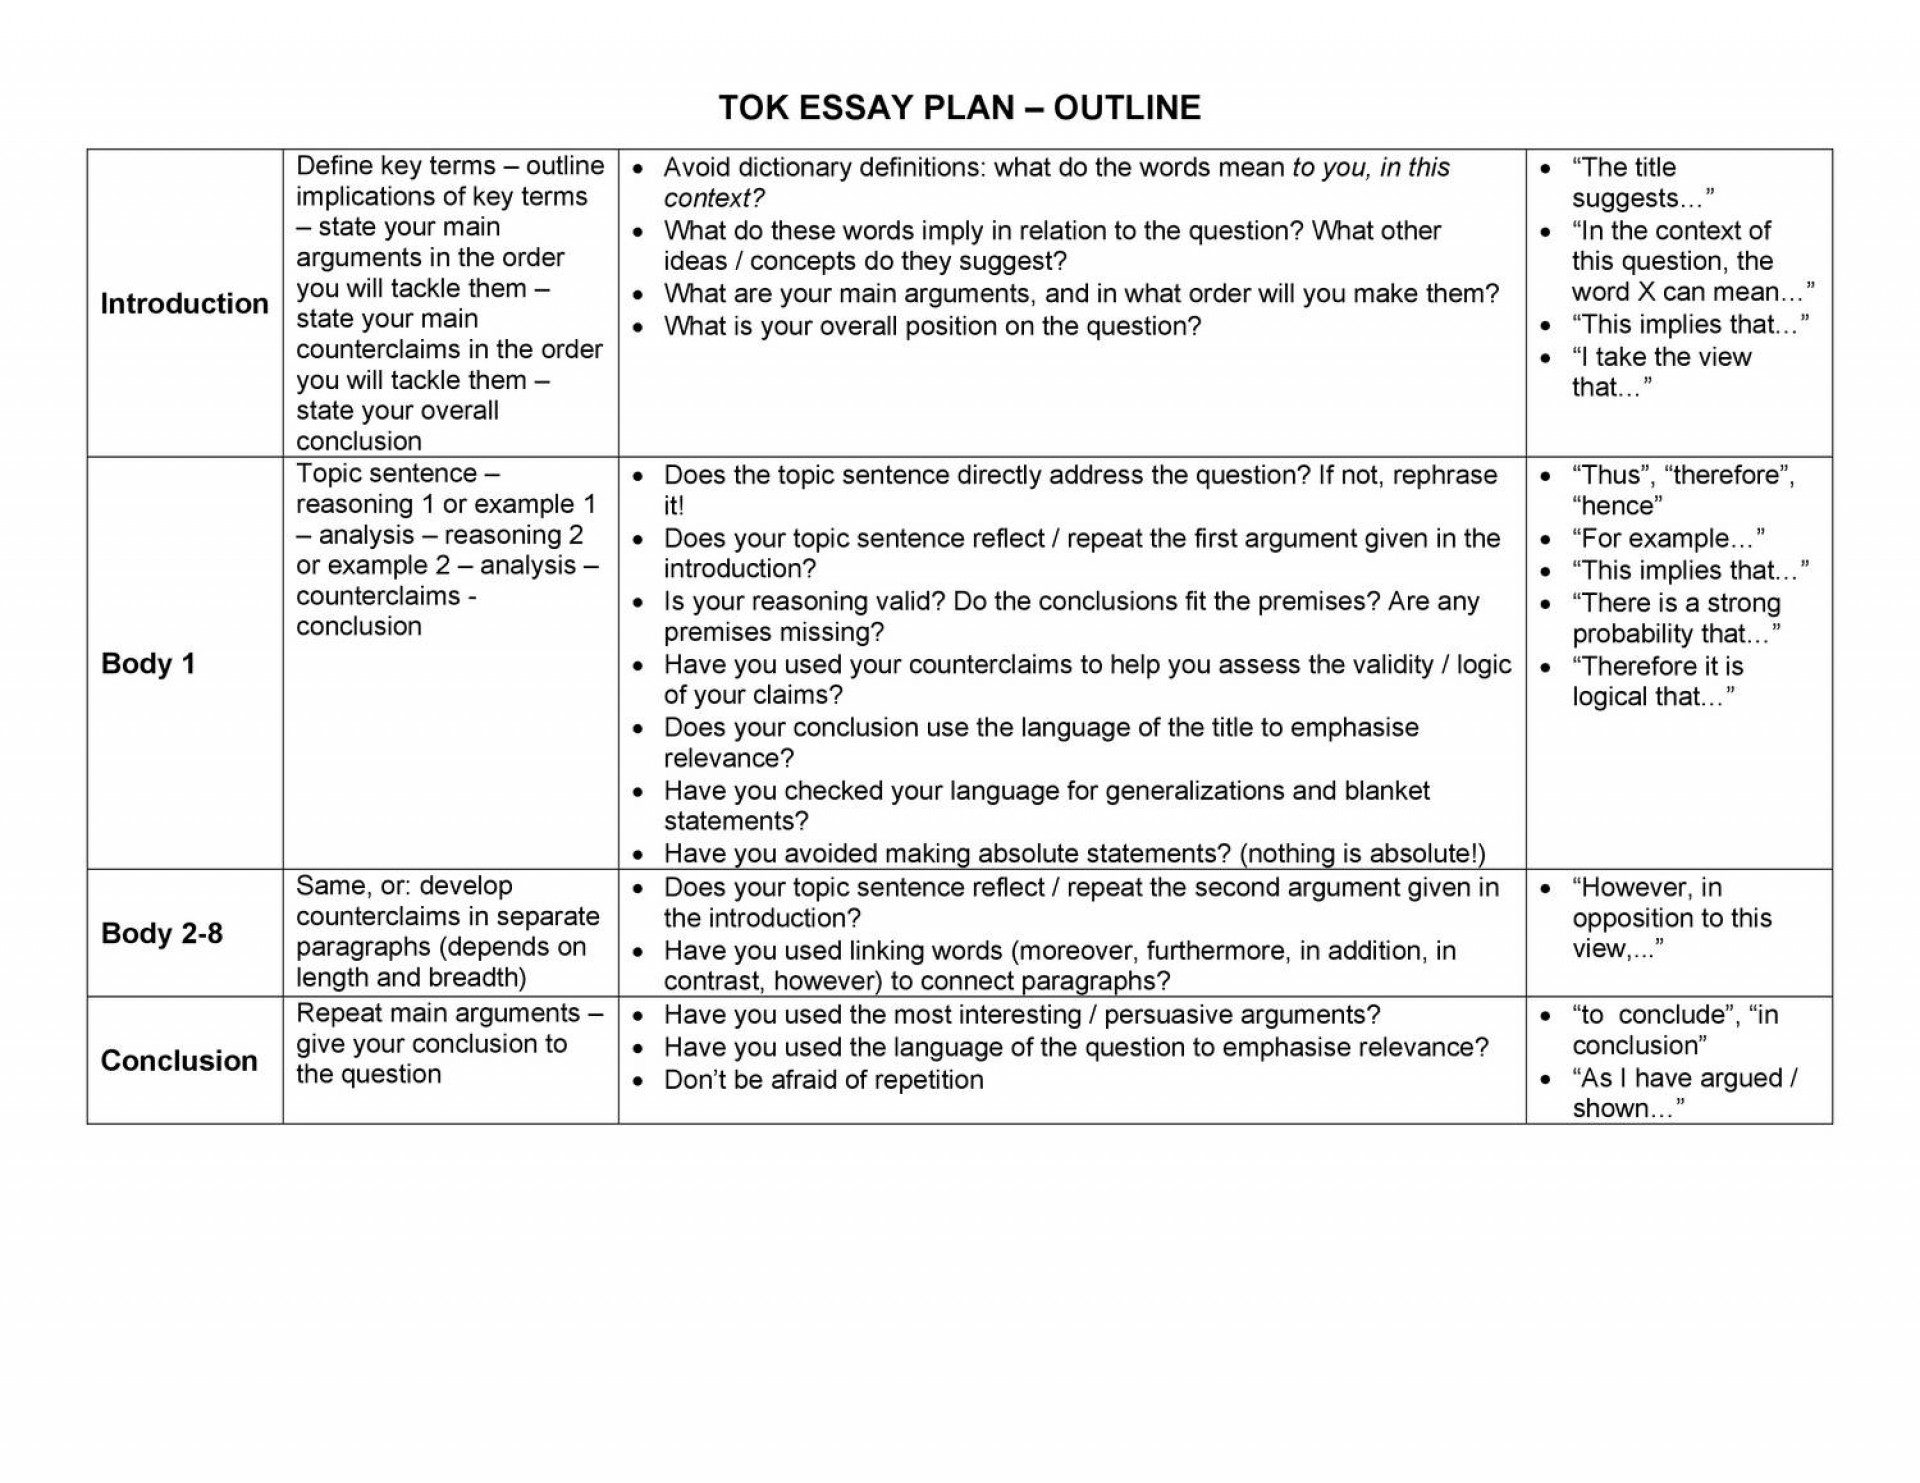 003 Tok Essay Plan Sensational Examples To Avoid Rubric 2019 Titles Ideas 1920